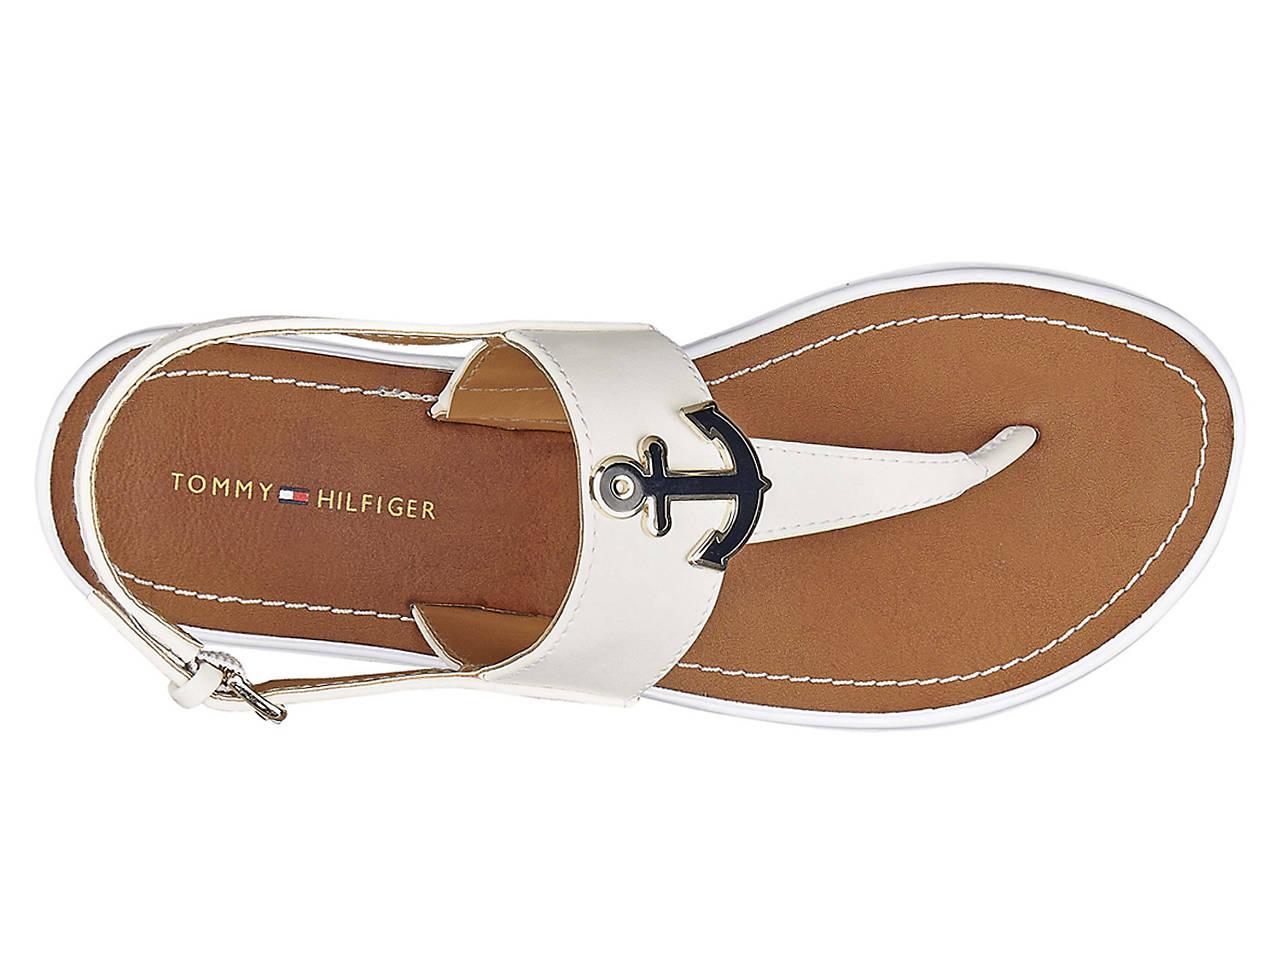 1cb2b0f829f730 Tommy Hilfiger Galiant Flat Sandal Women s Shoes